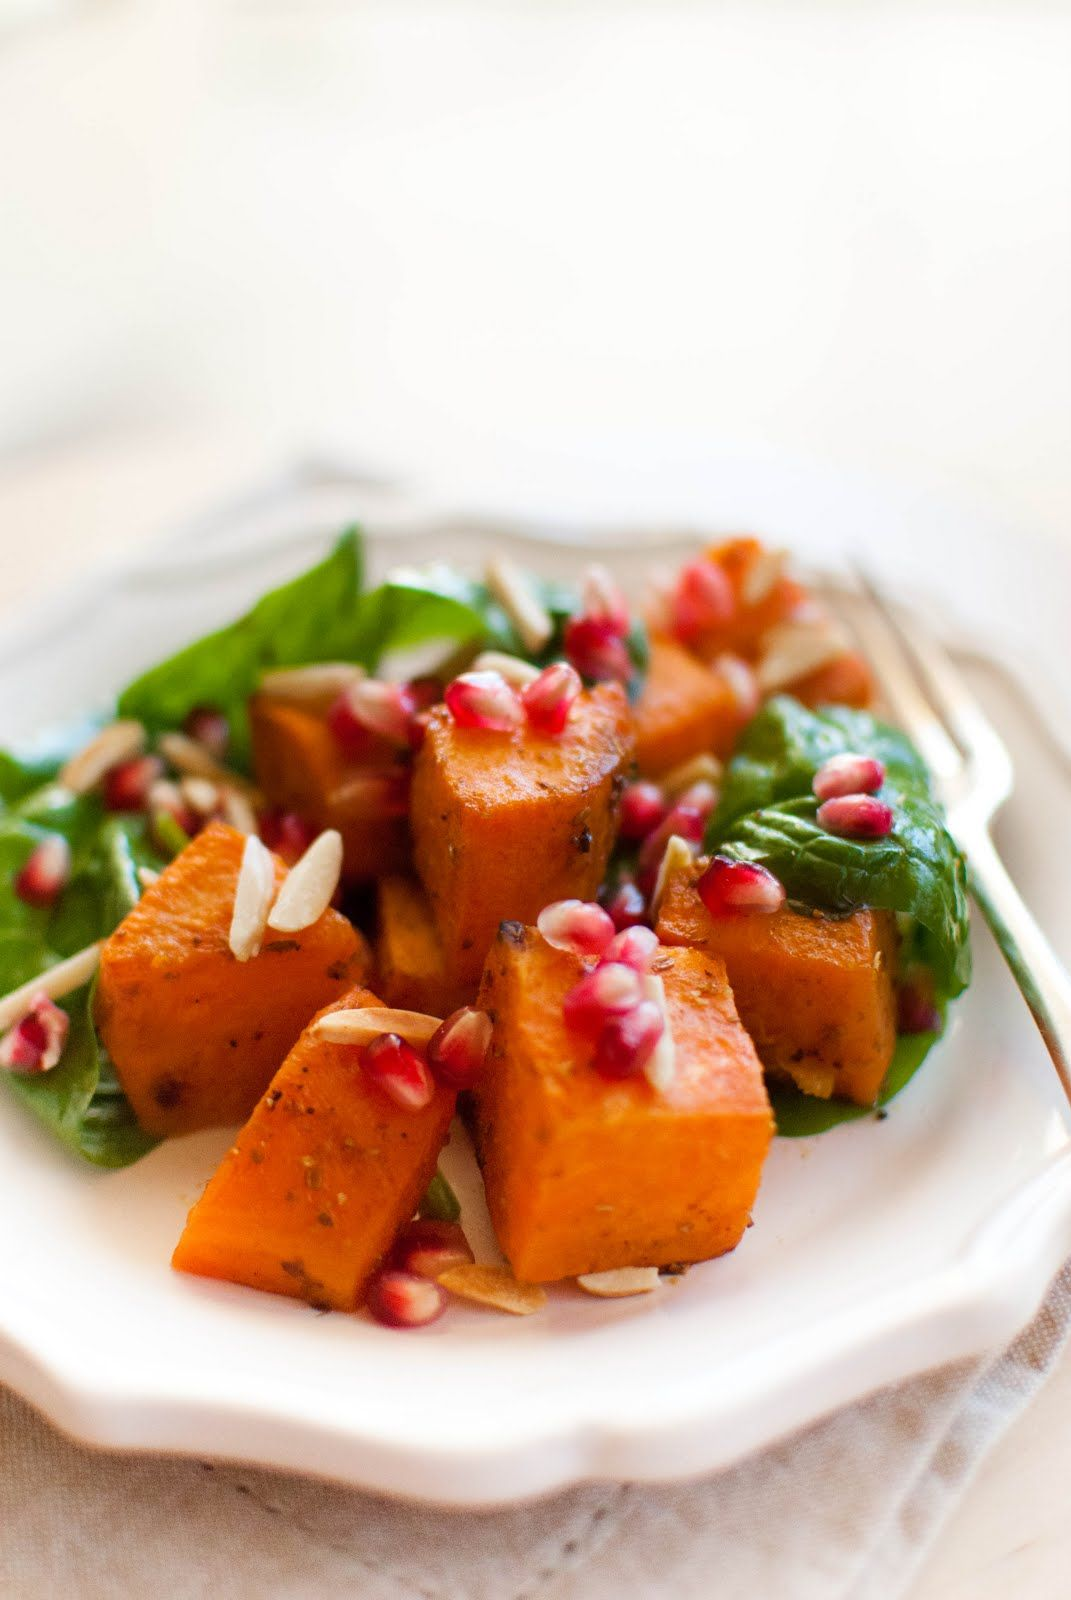 Scandi Home: Roasted Sweet Potato and Pomegranate Salad